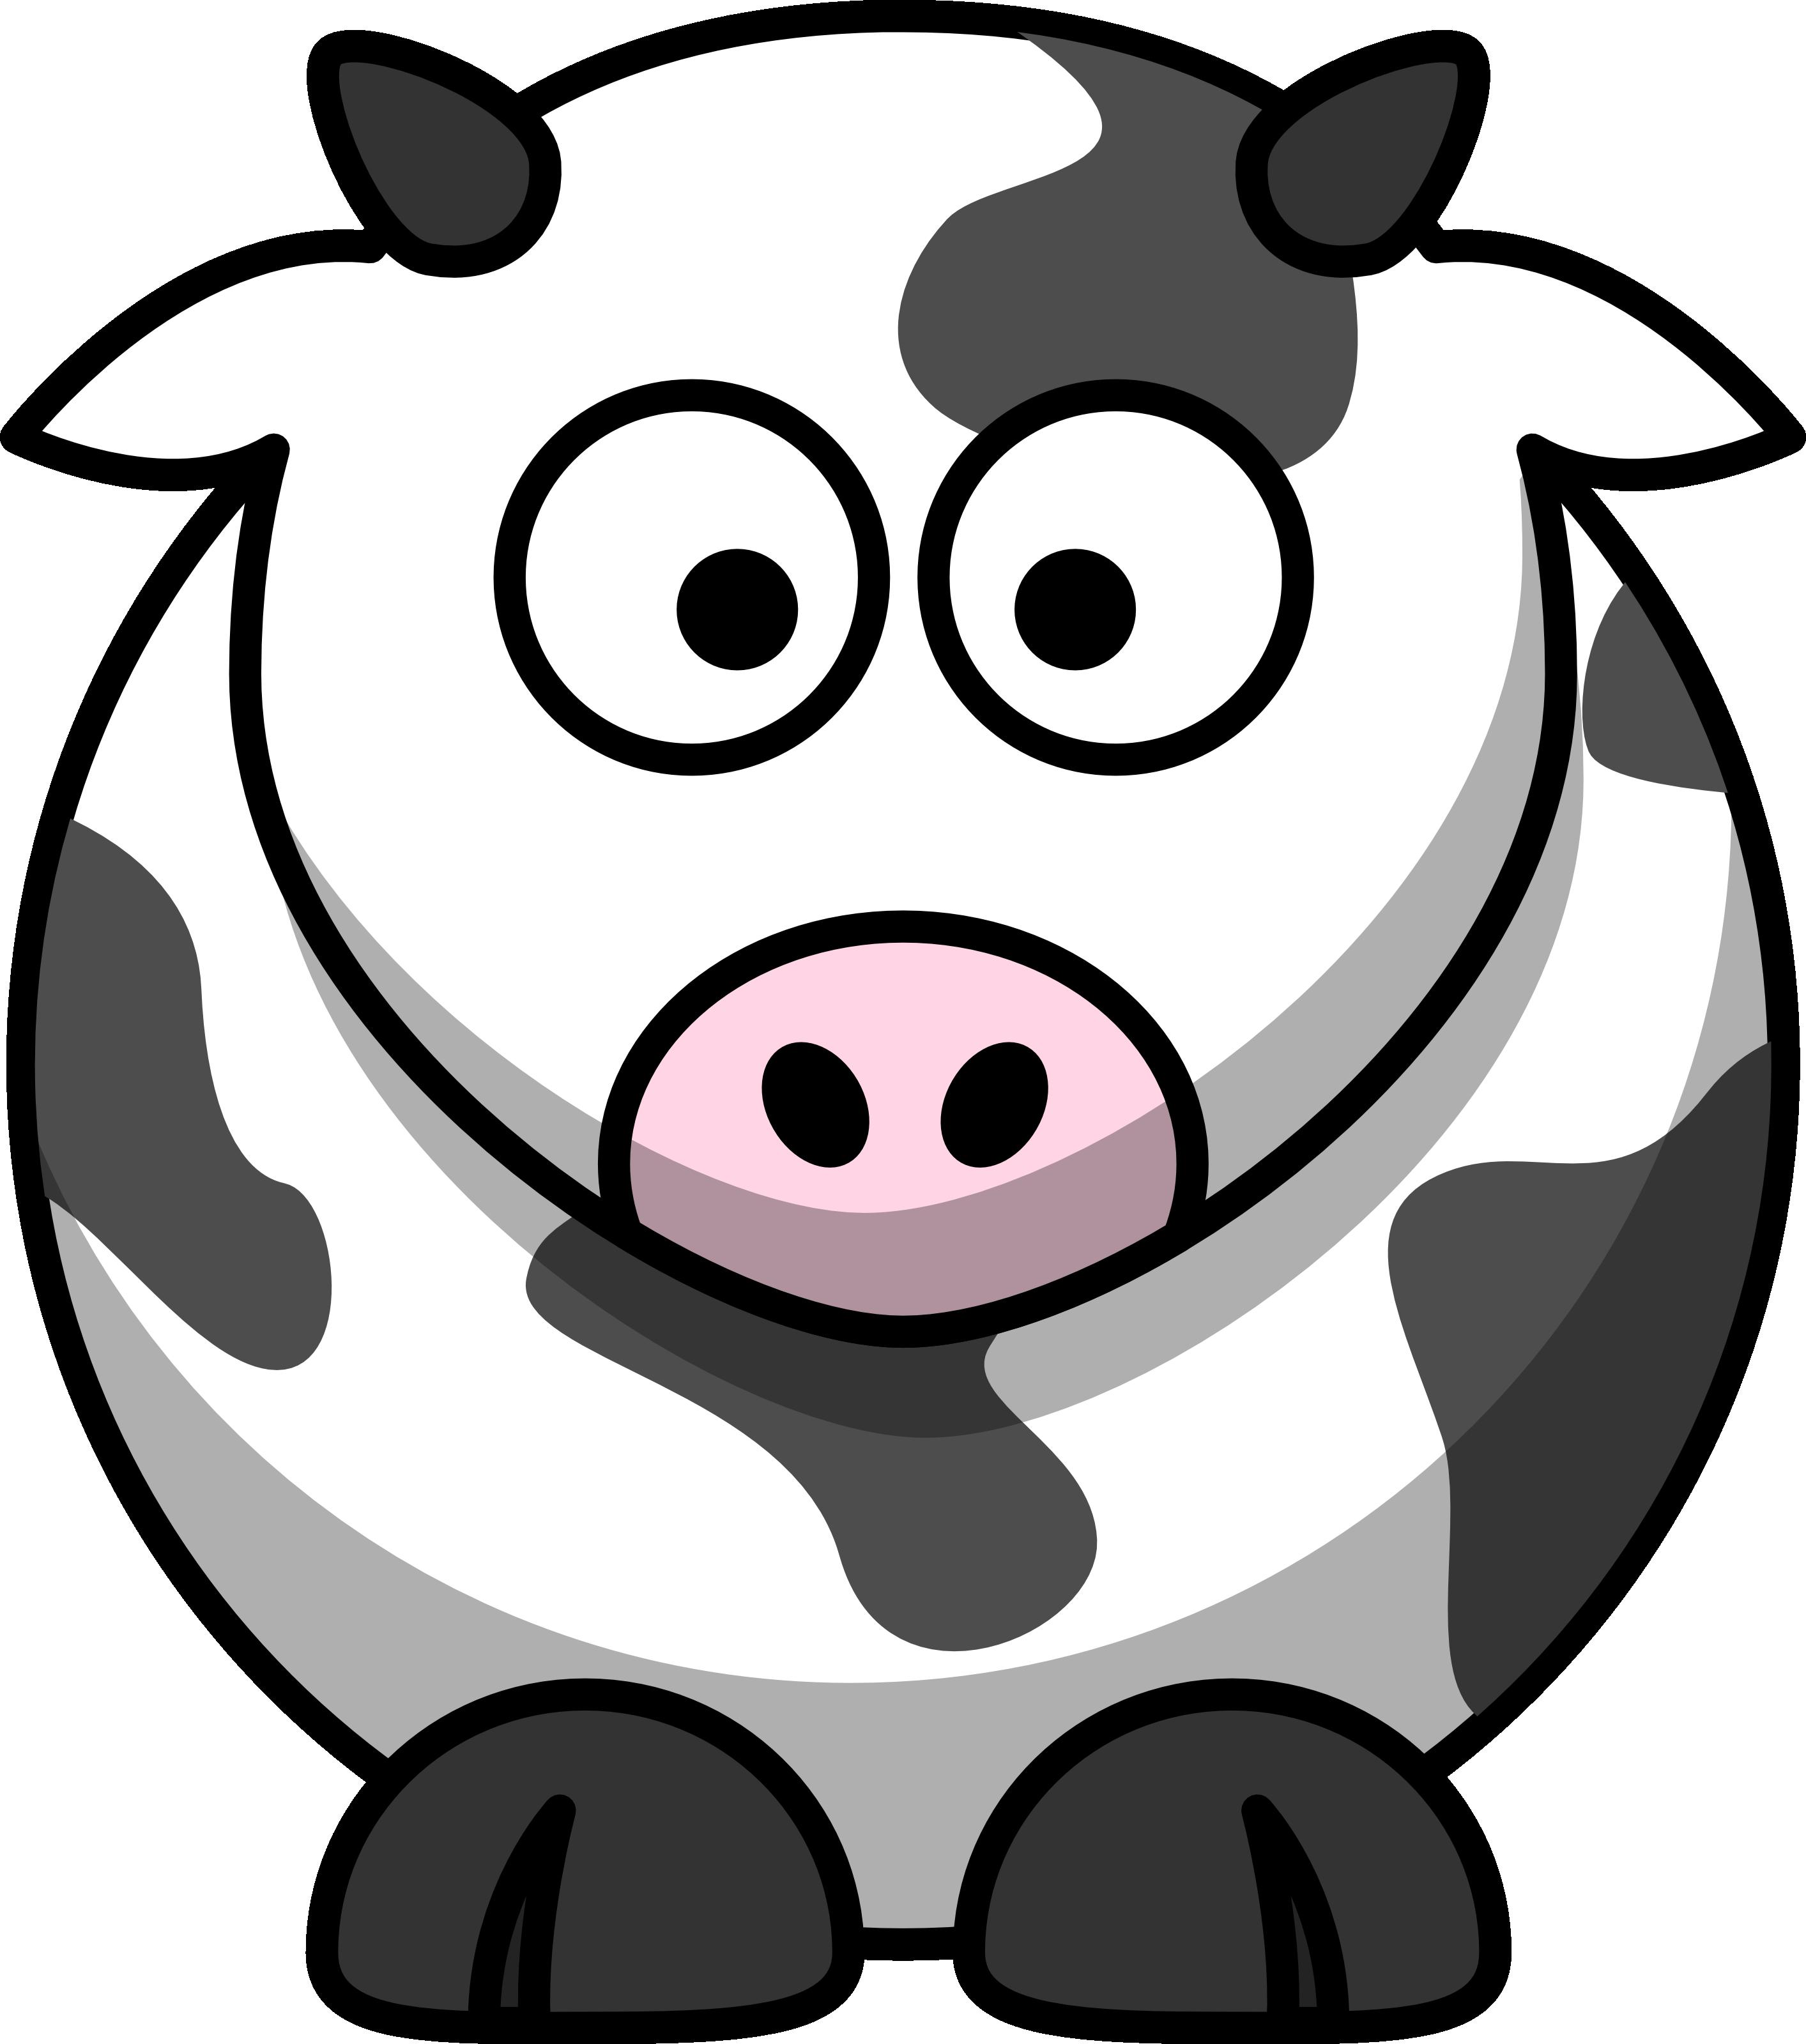 Free Cartoon Cow Clip Art By 000149 .-Free Cartoon Cow Clip Art by 000149 .-17